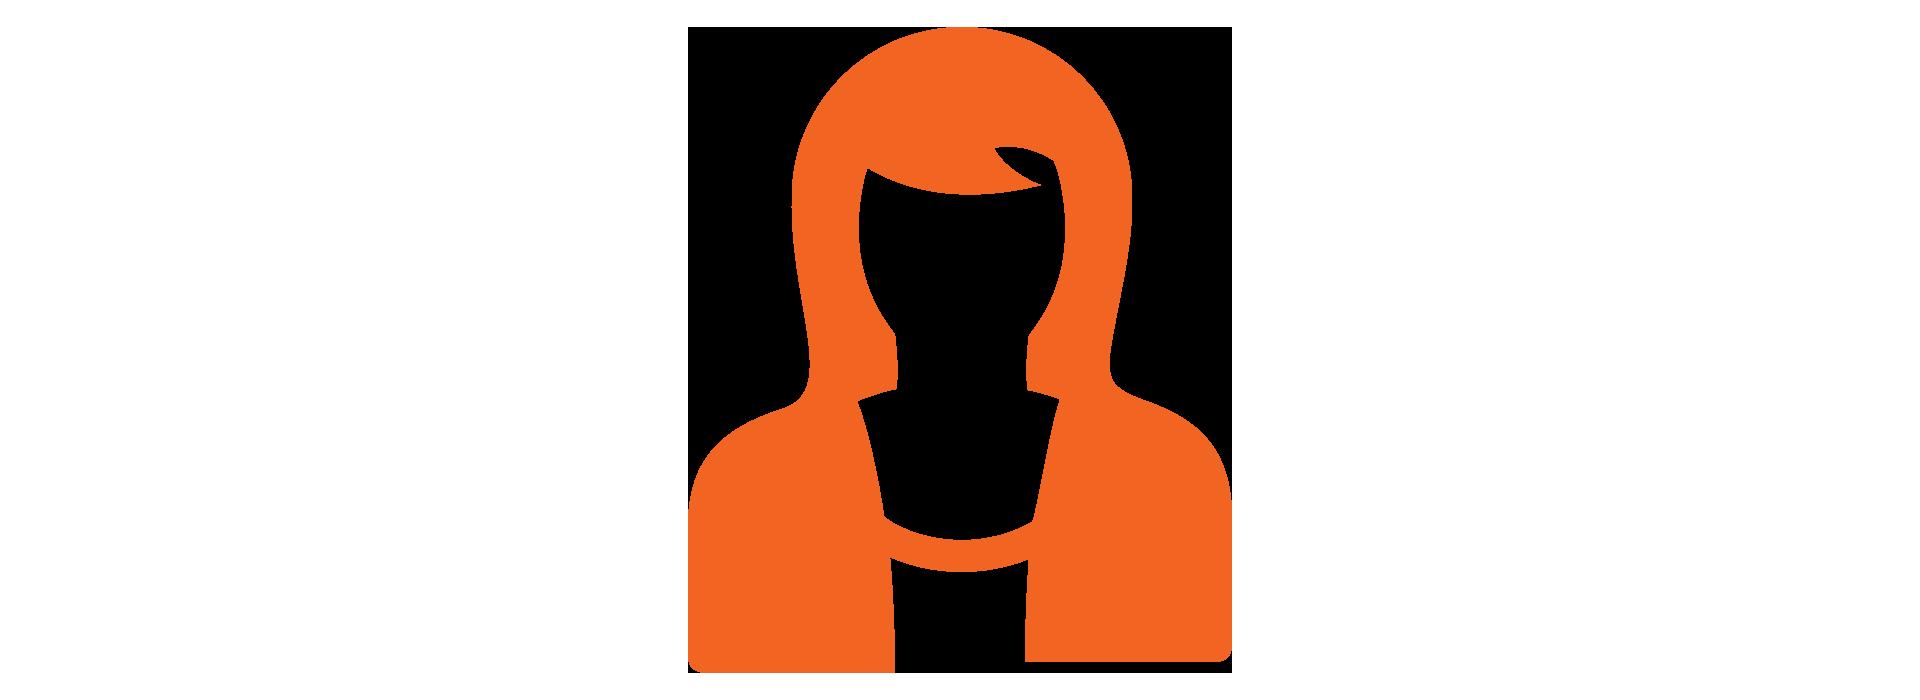 graphic of female leader in Sienna Orange